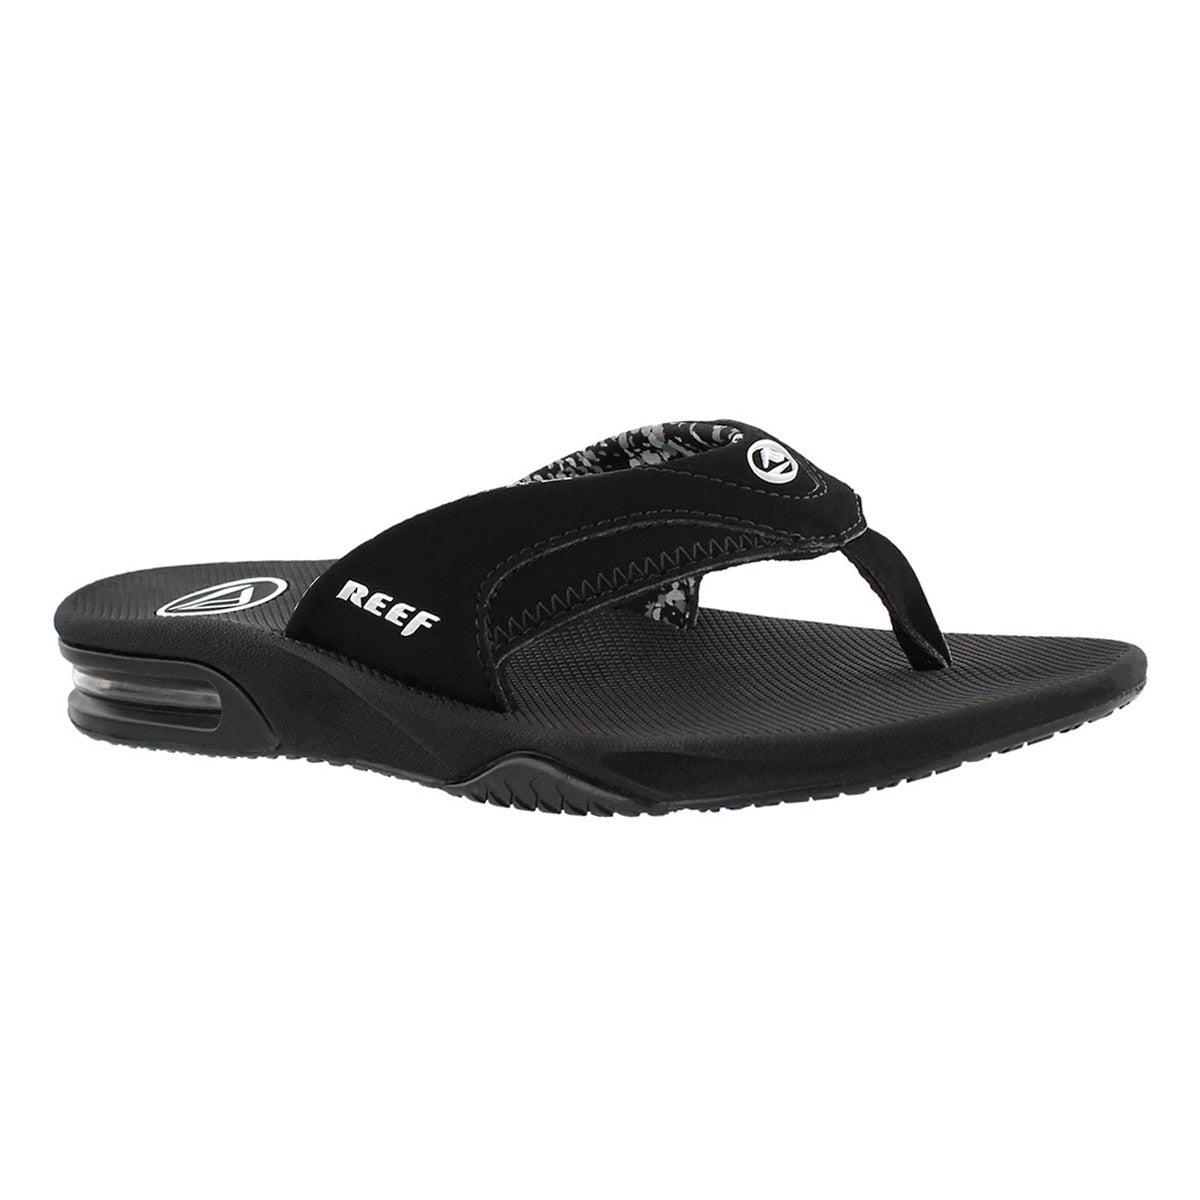 Women's FANNING black thong sandals